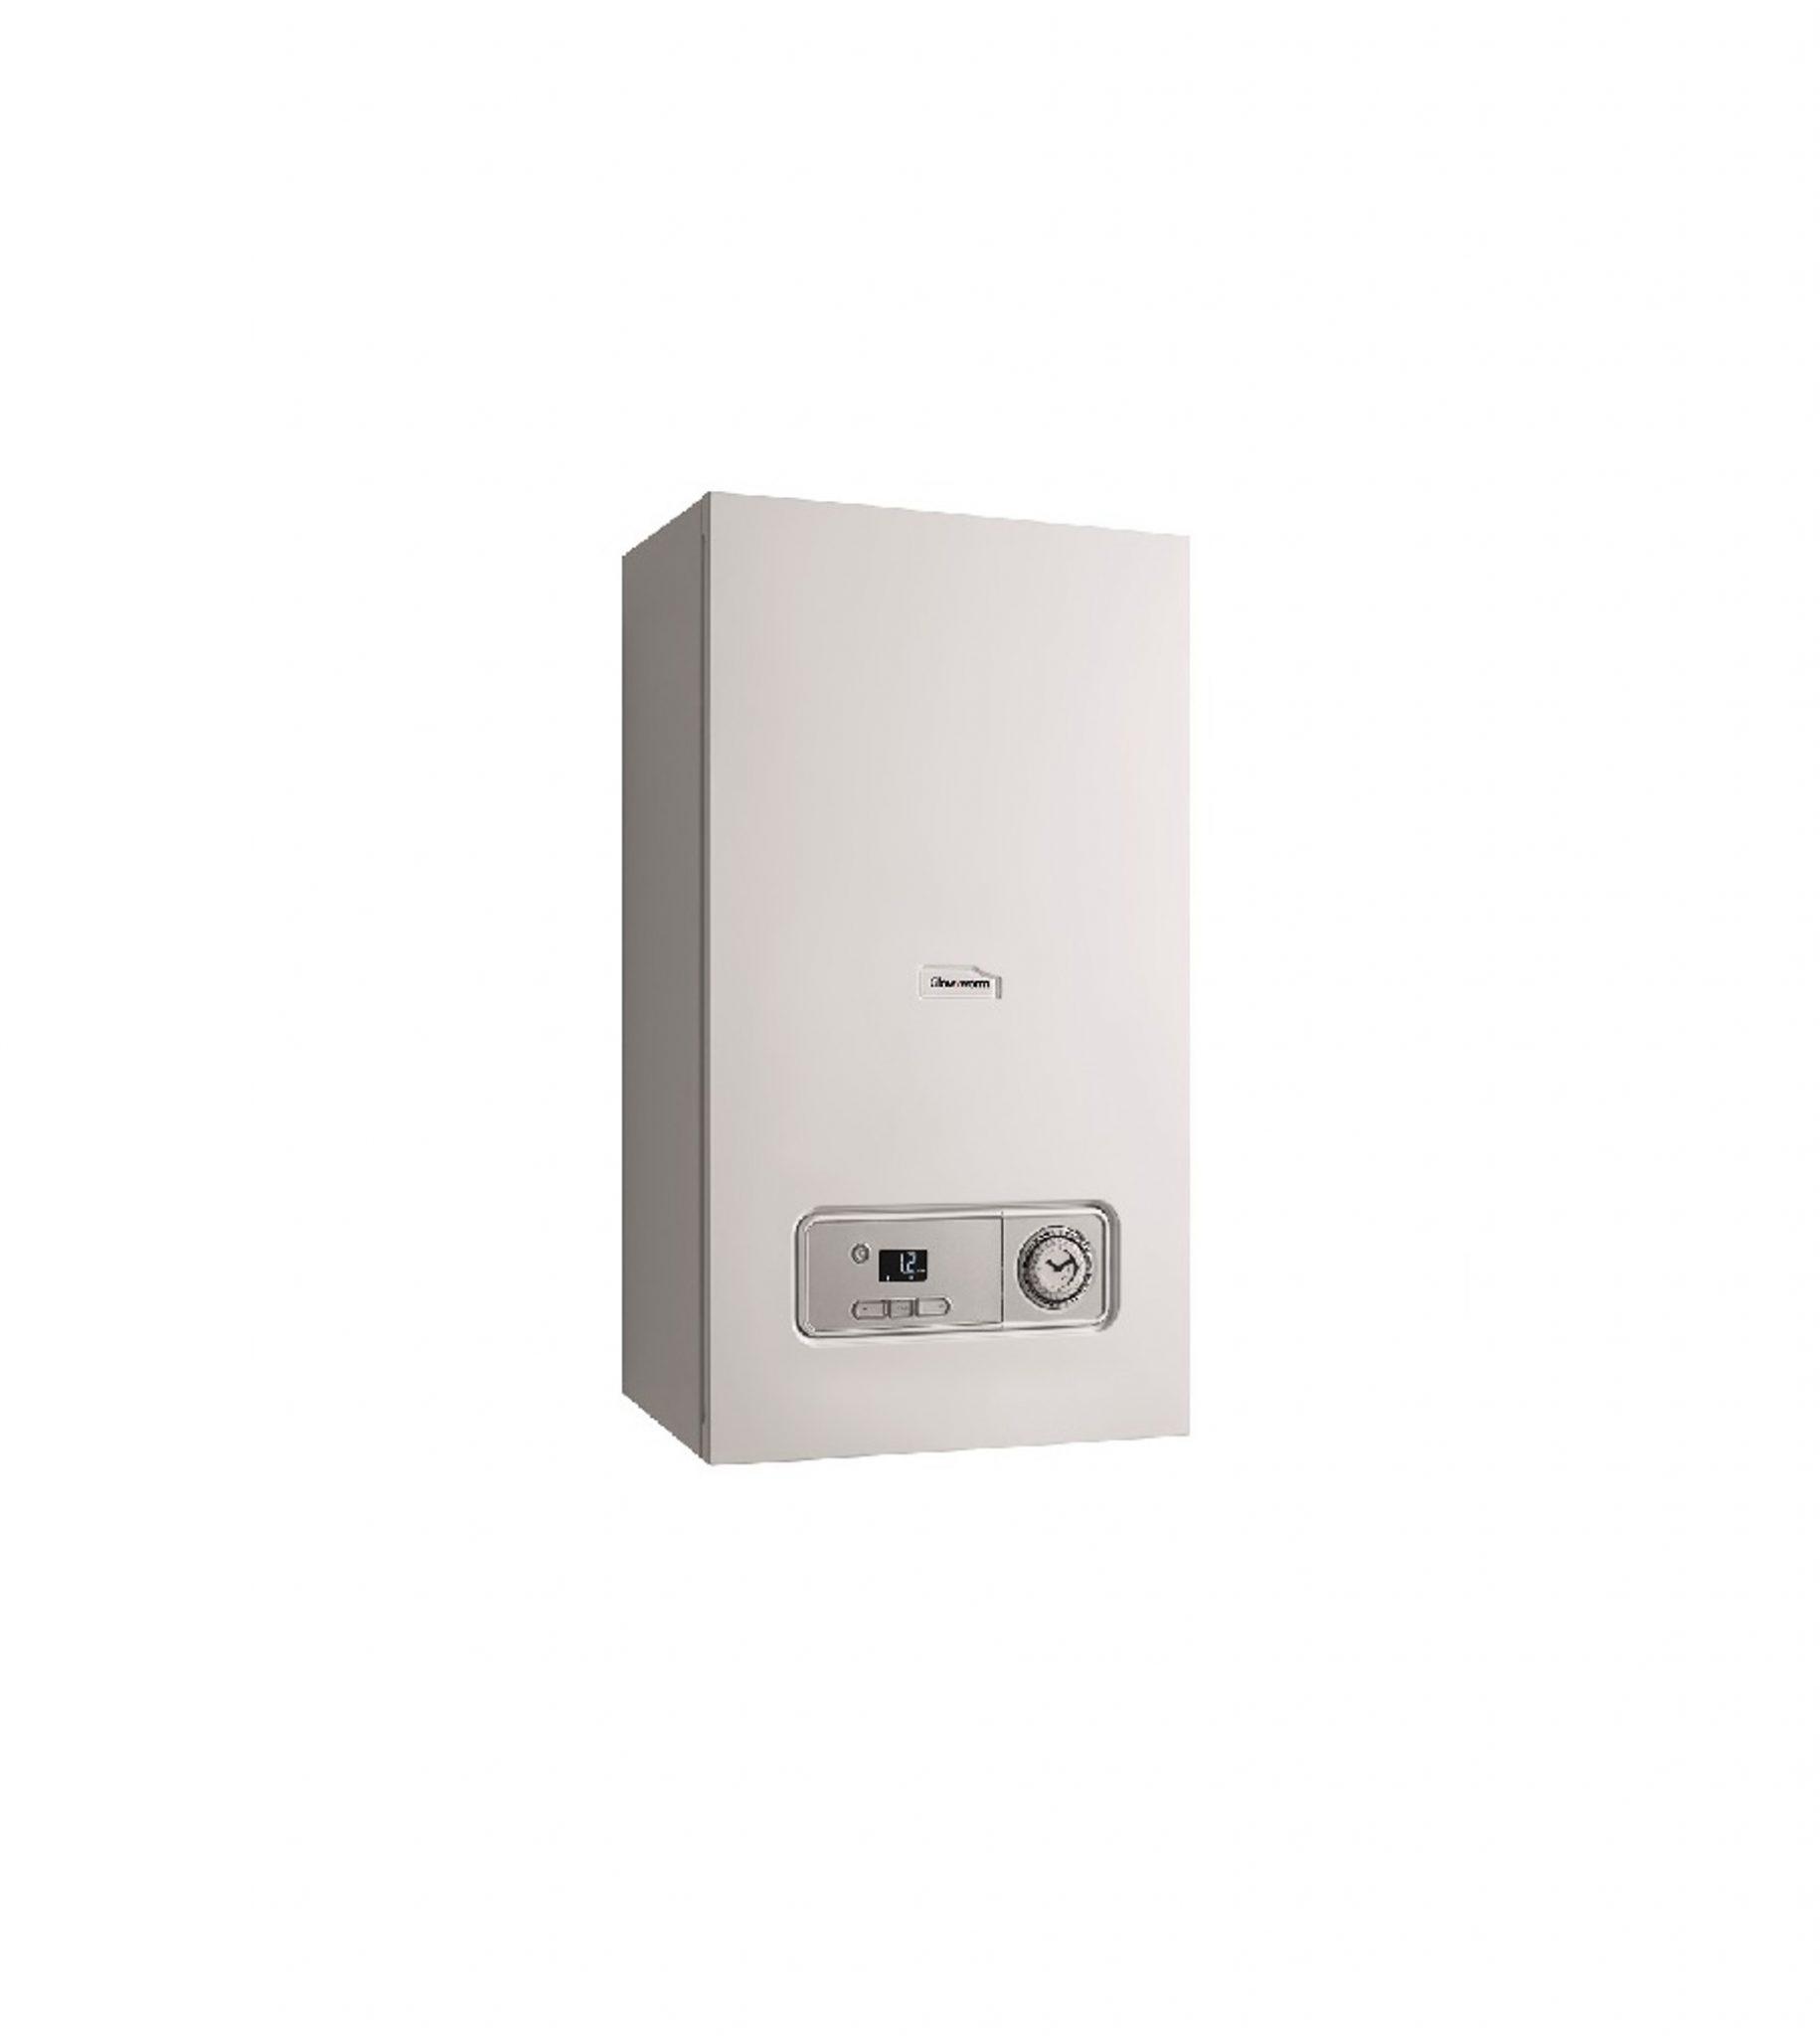 Betacom Combi Boiler